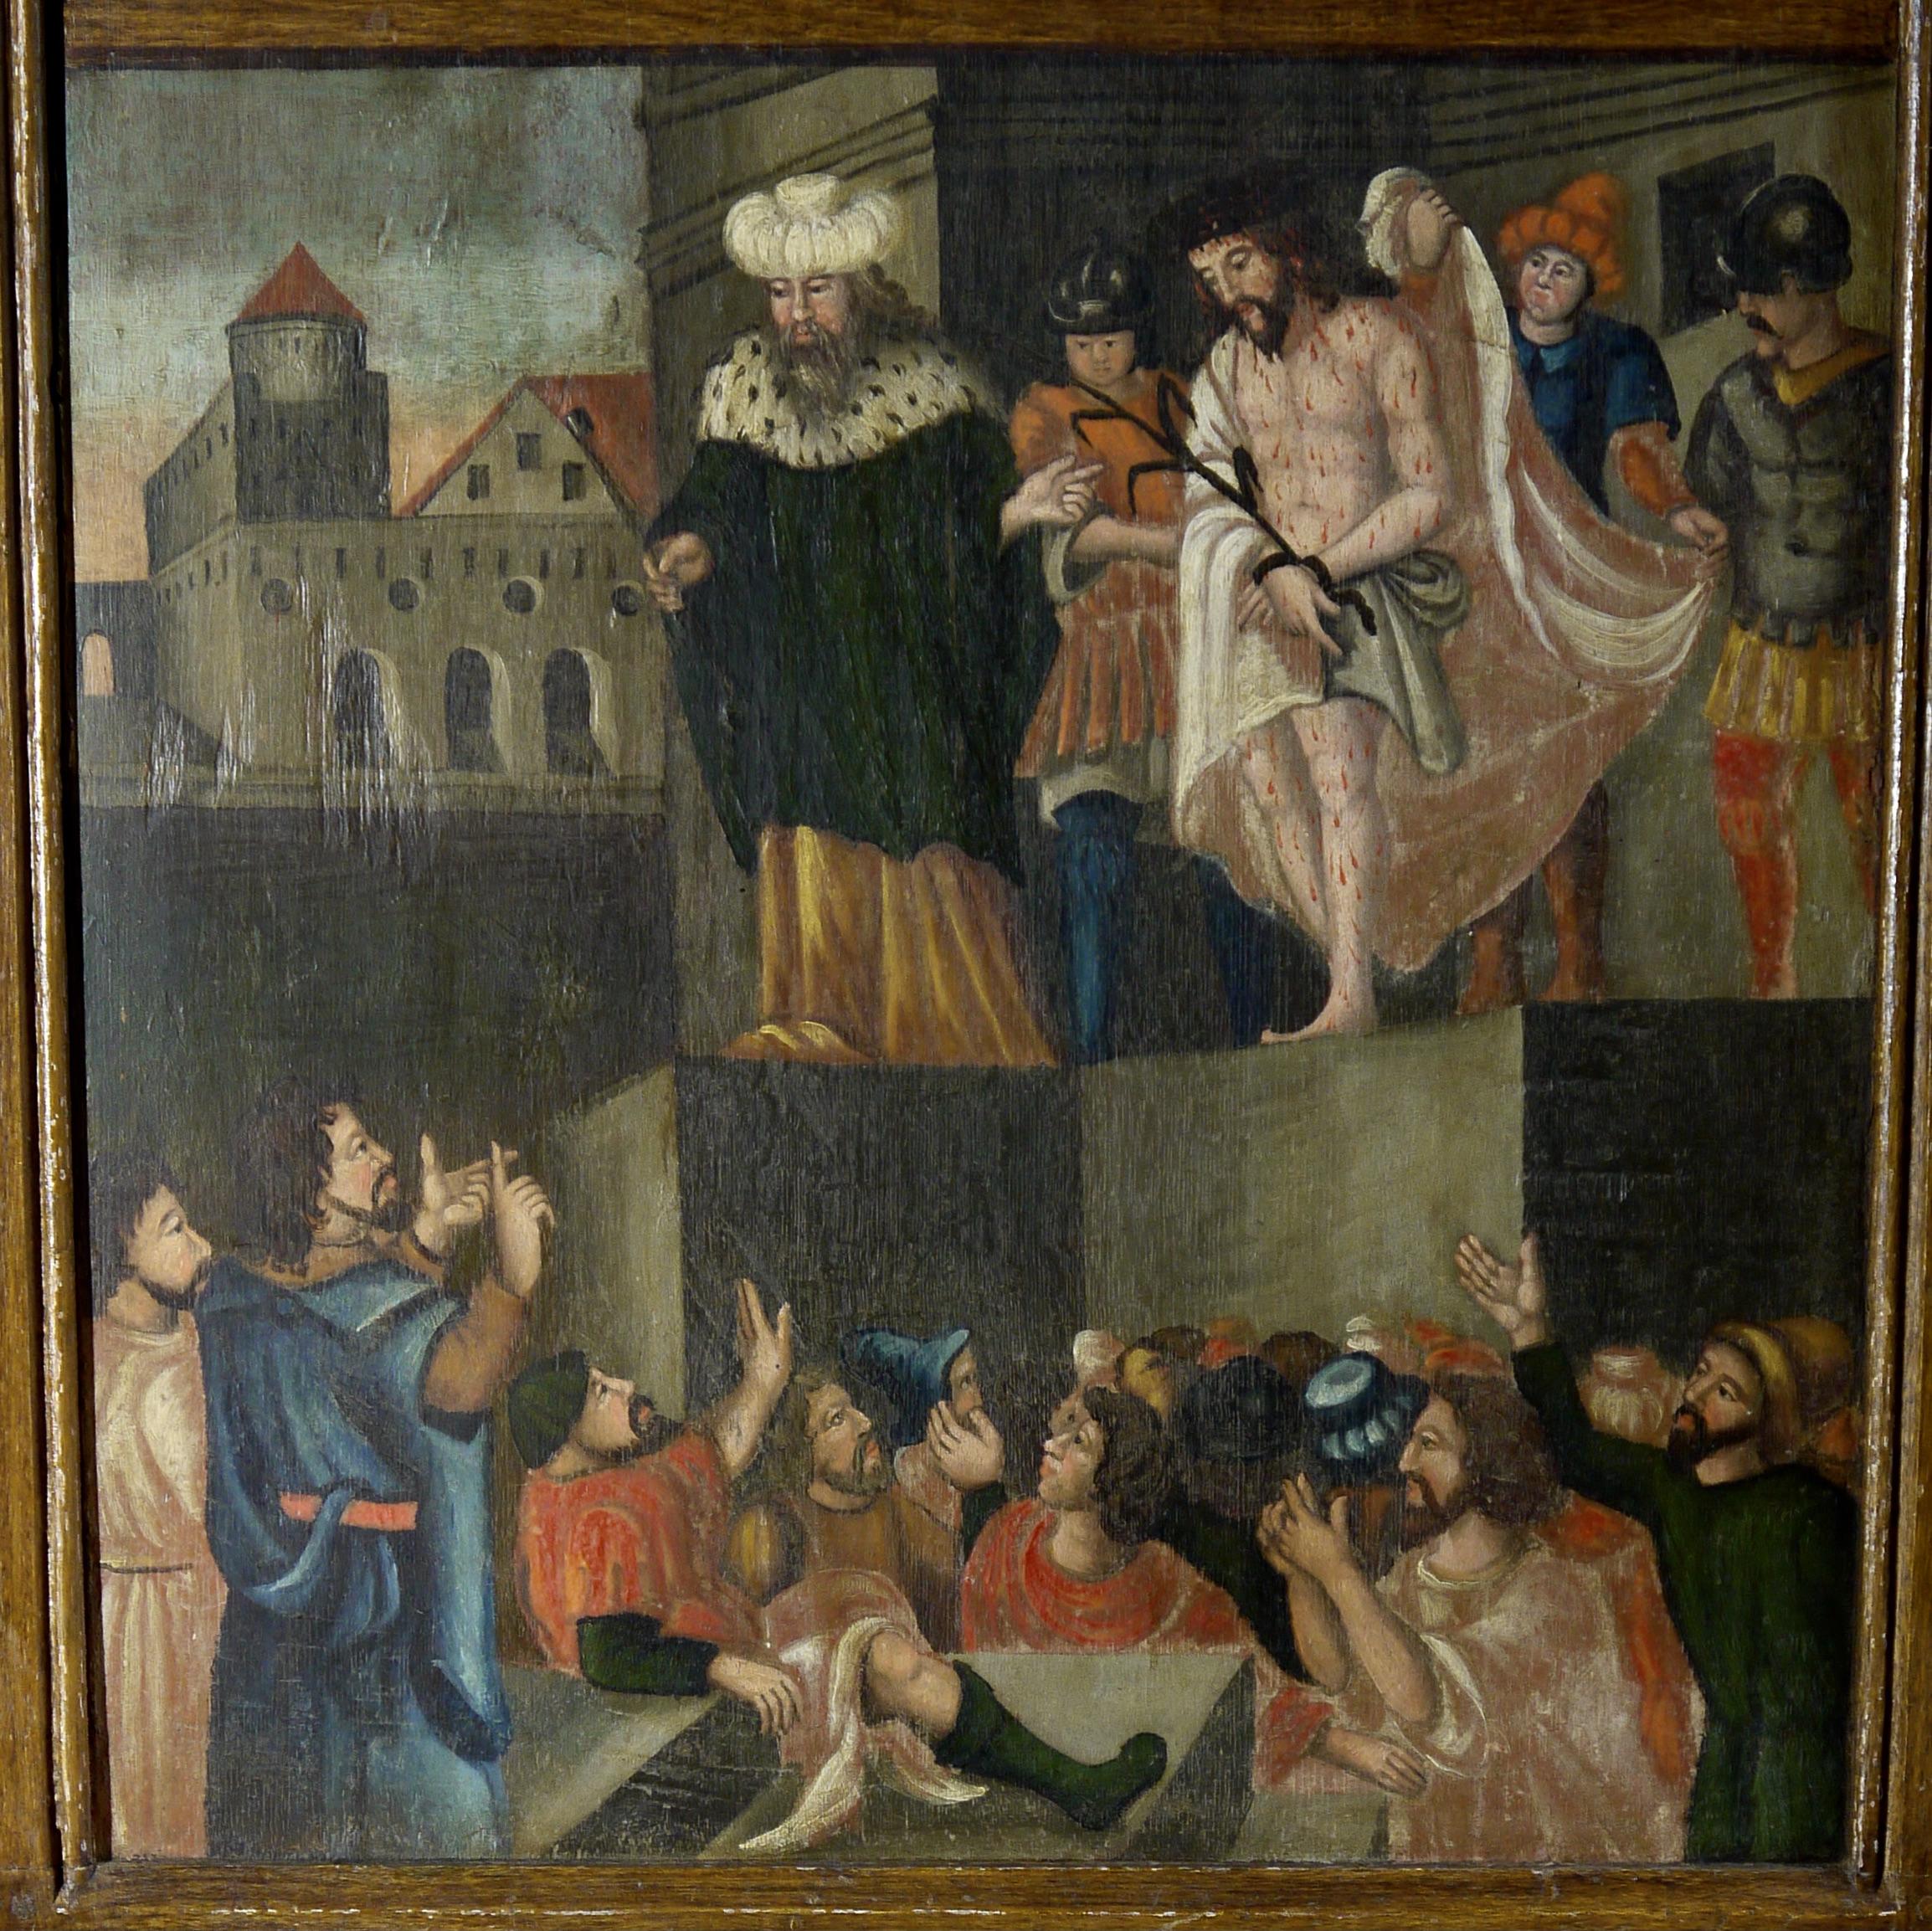 Stuer, barocker Flügel, Stuer, Barocktafel, Passion, Pontius Pilatus